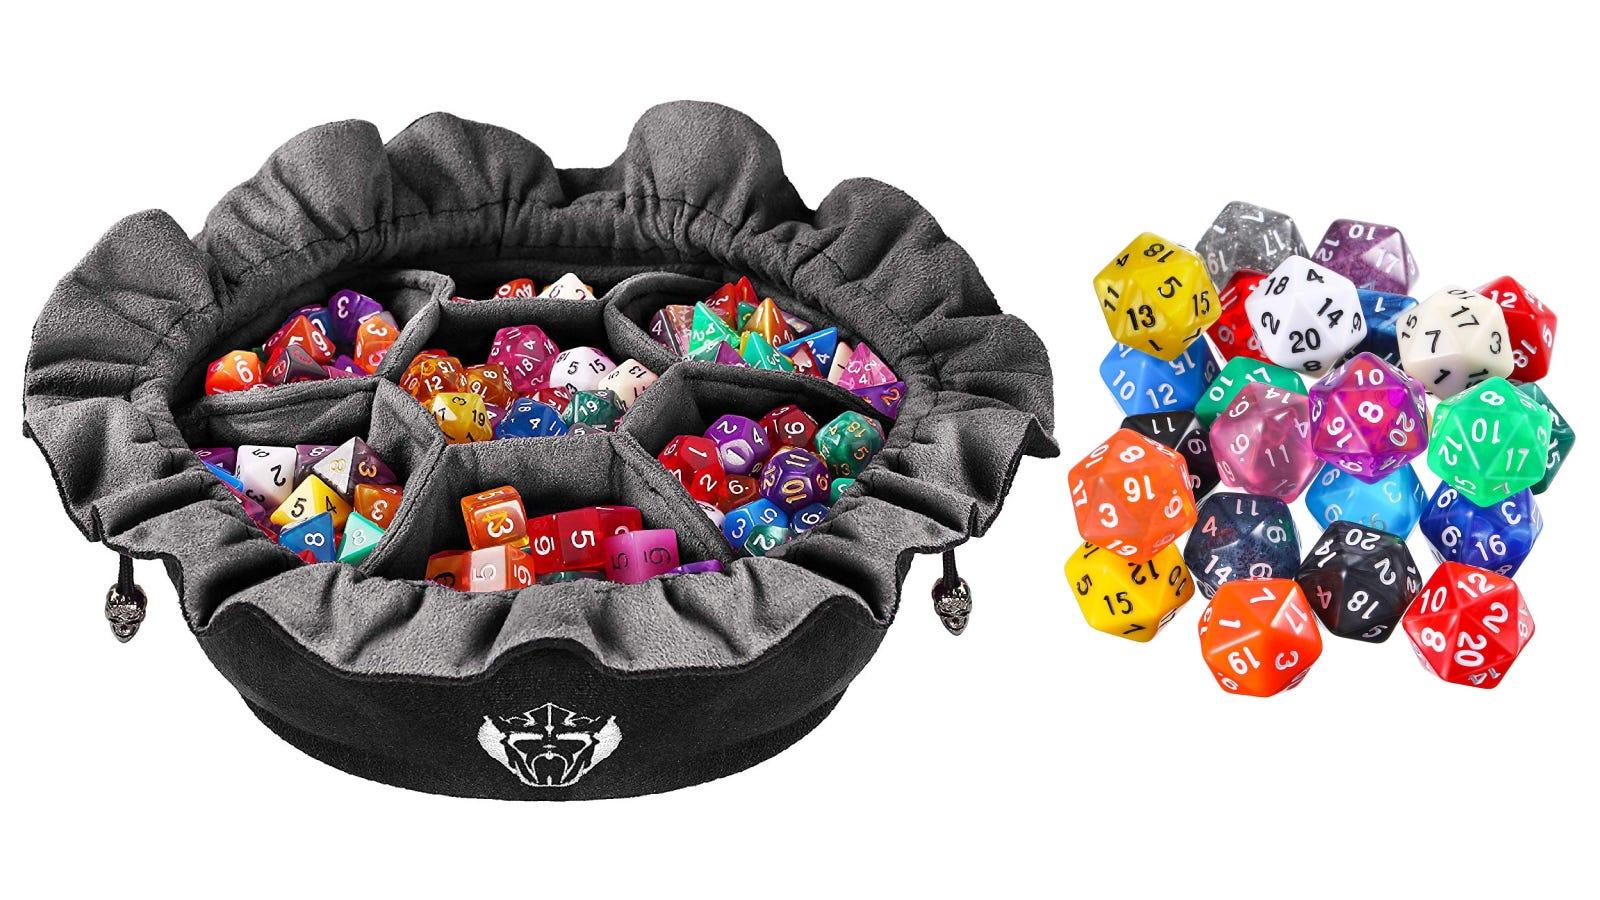 KingCardPro Dice Bag, TecUnite 25 Piece D20 Set